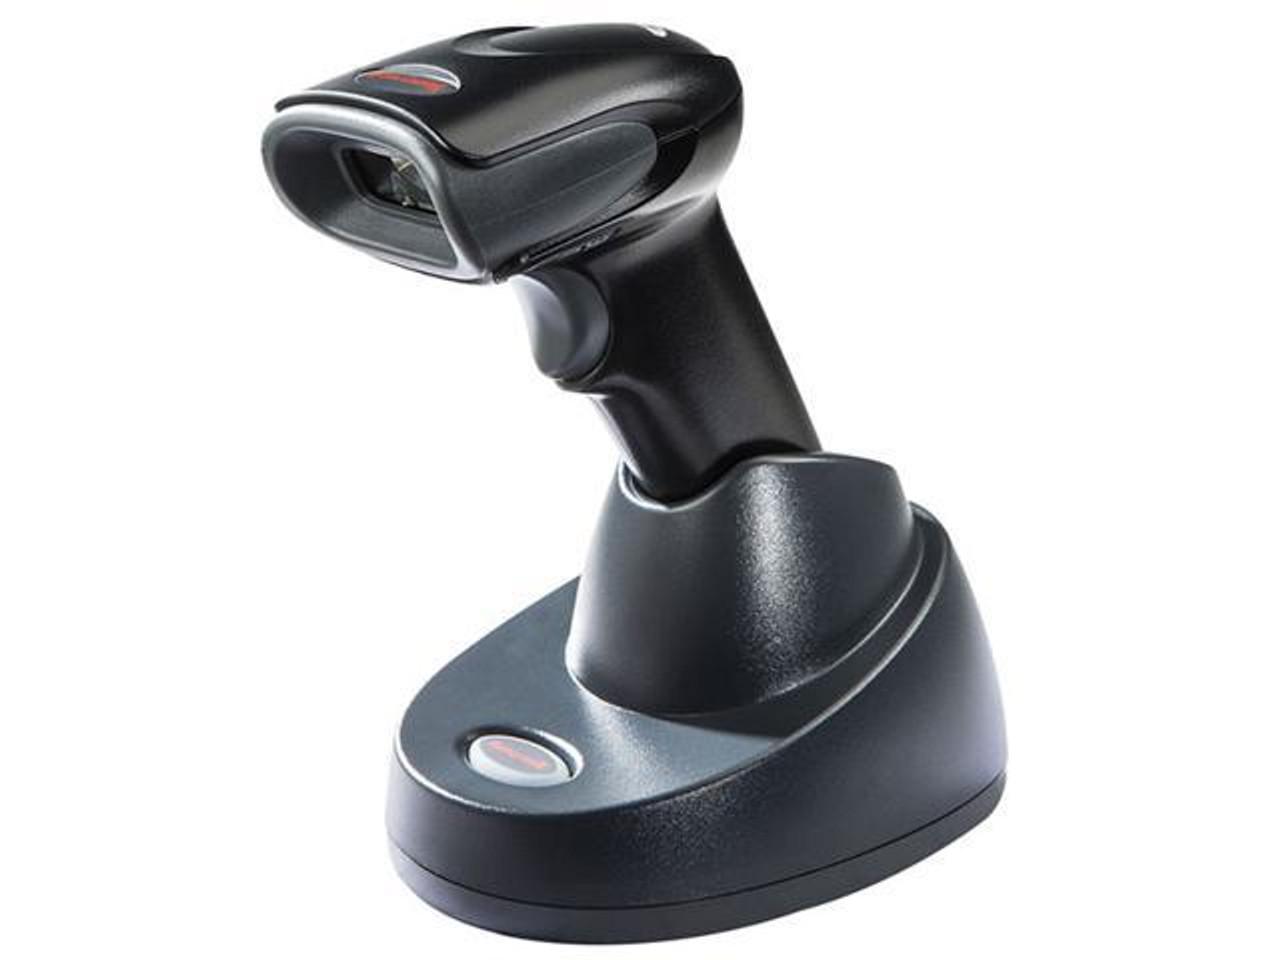 Honeywell Voyager™ (XP) 1472g Cordless Scanner